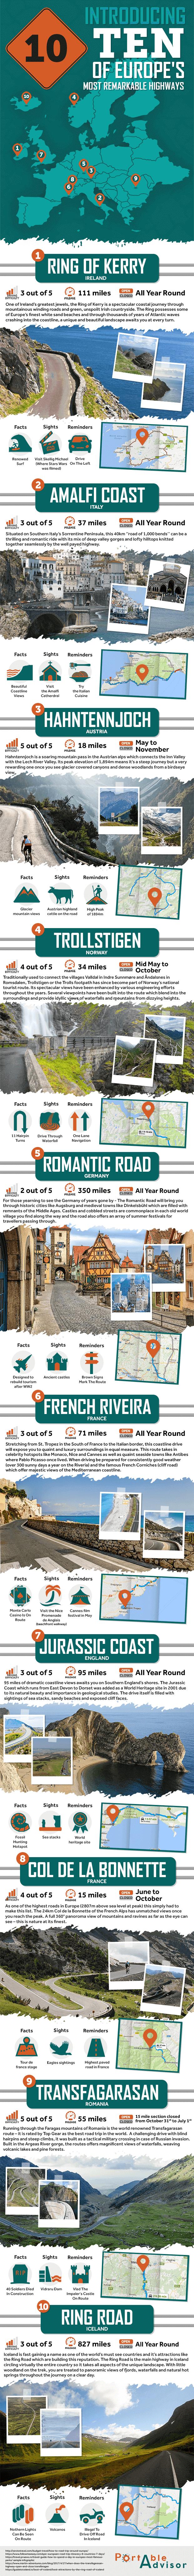 10 remarkable European road trips